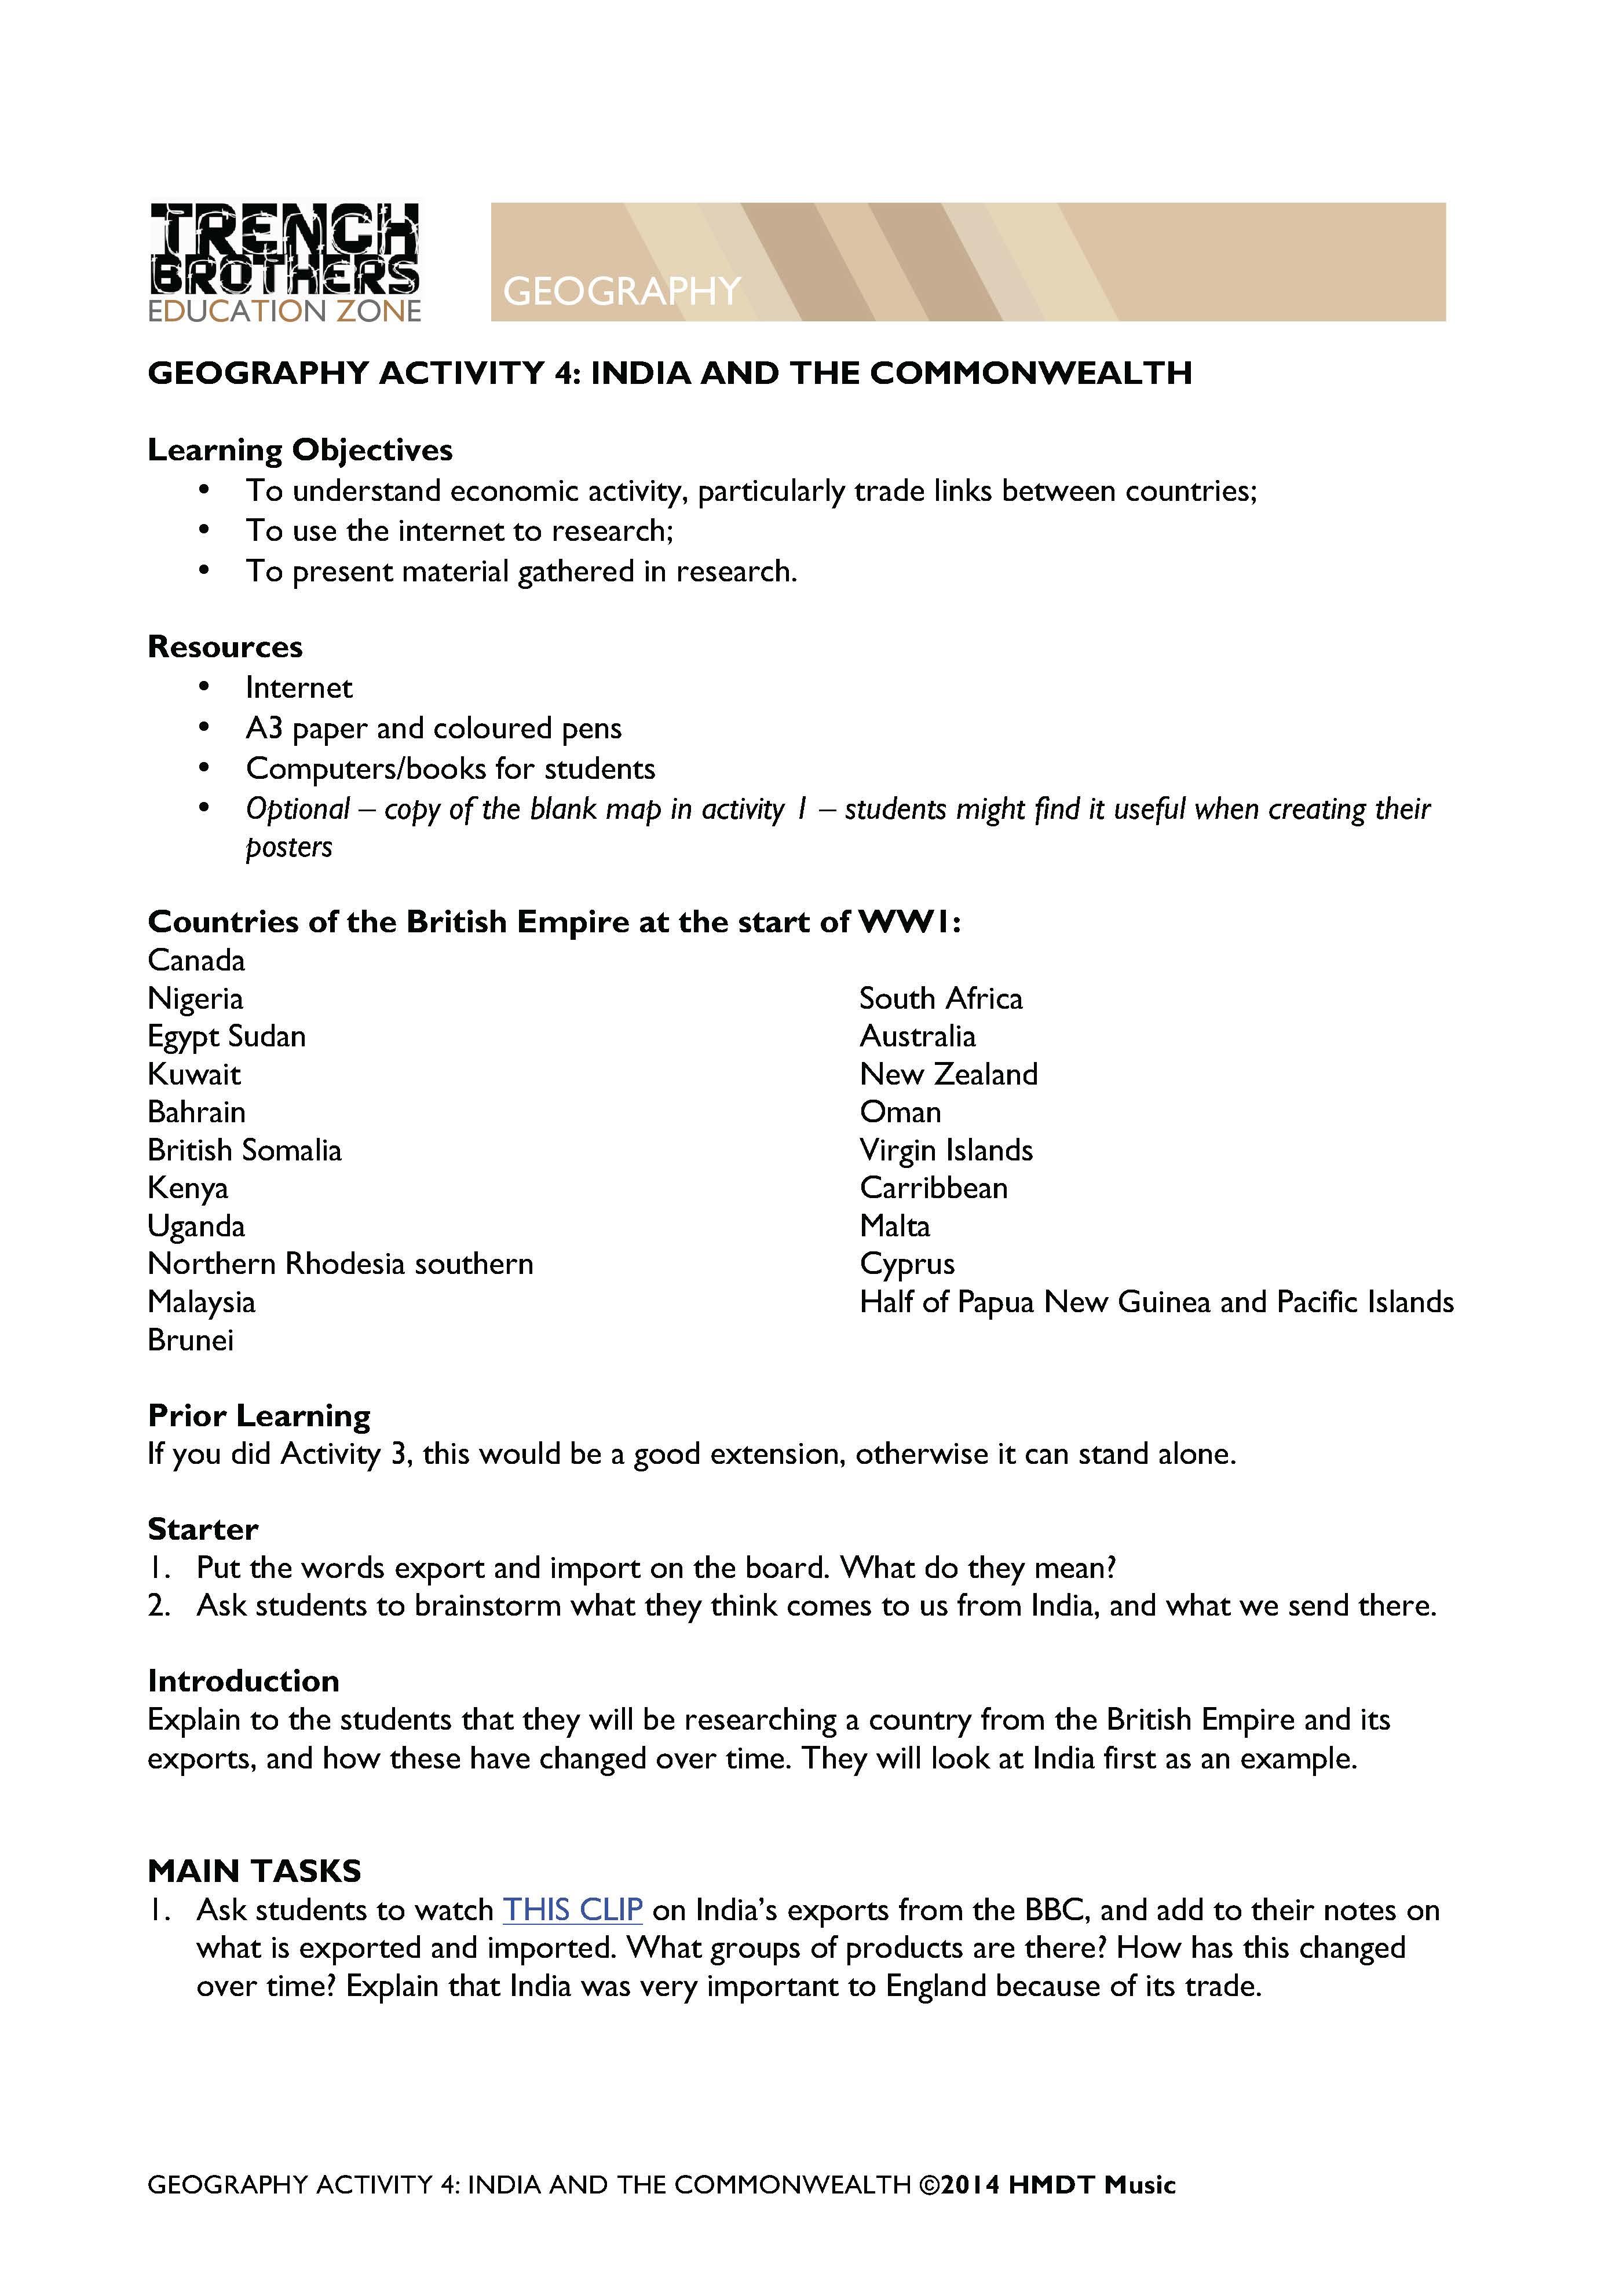 Climate Maps Worksheet